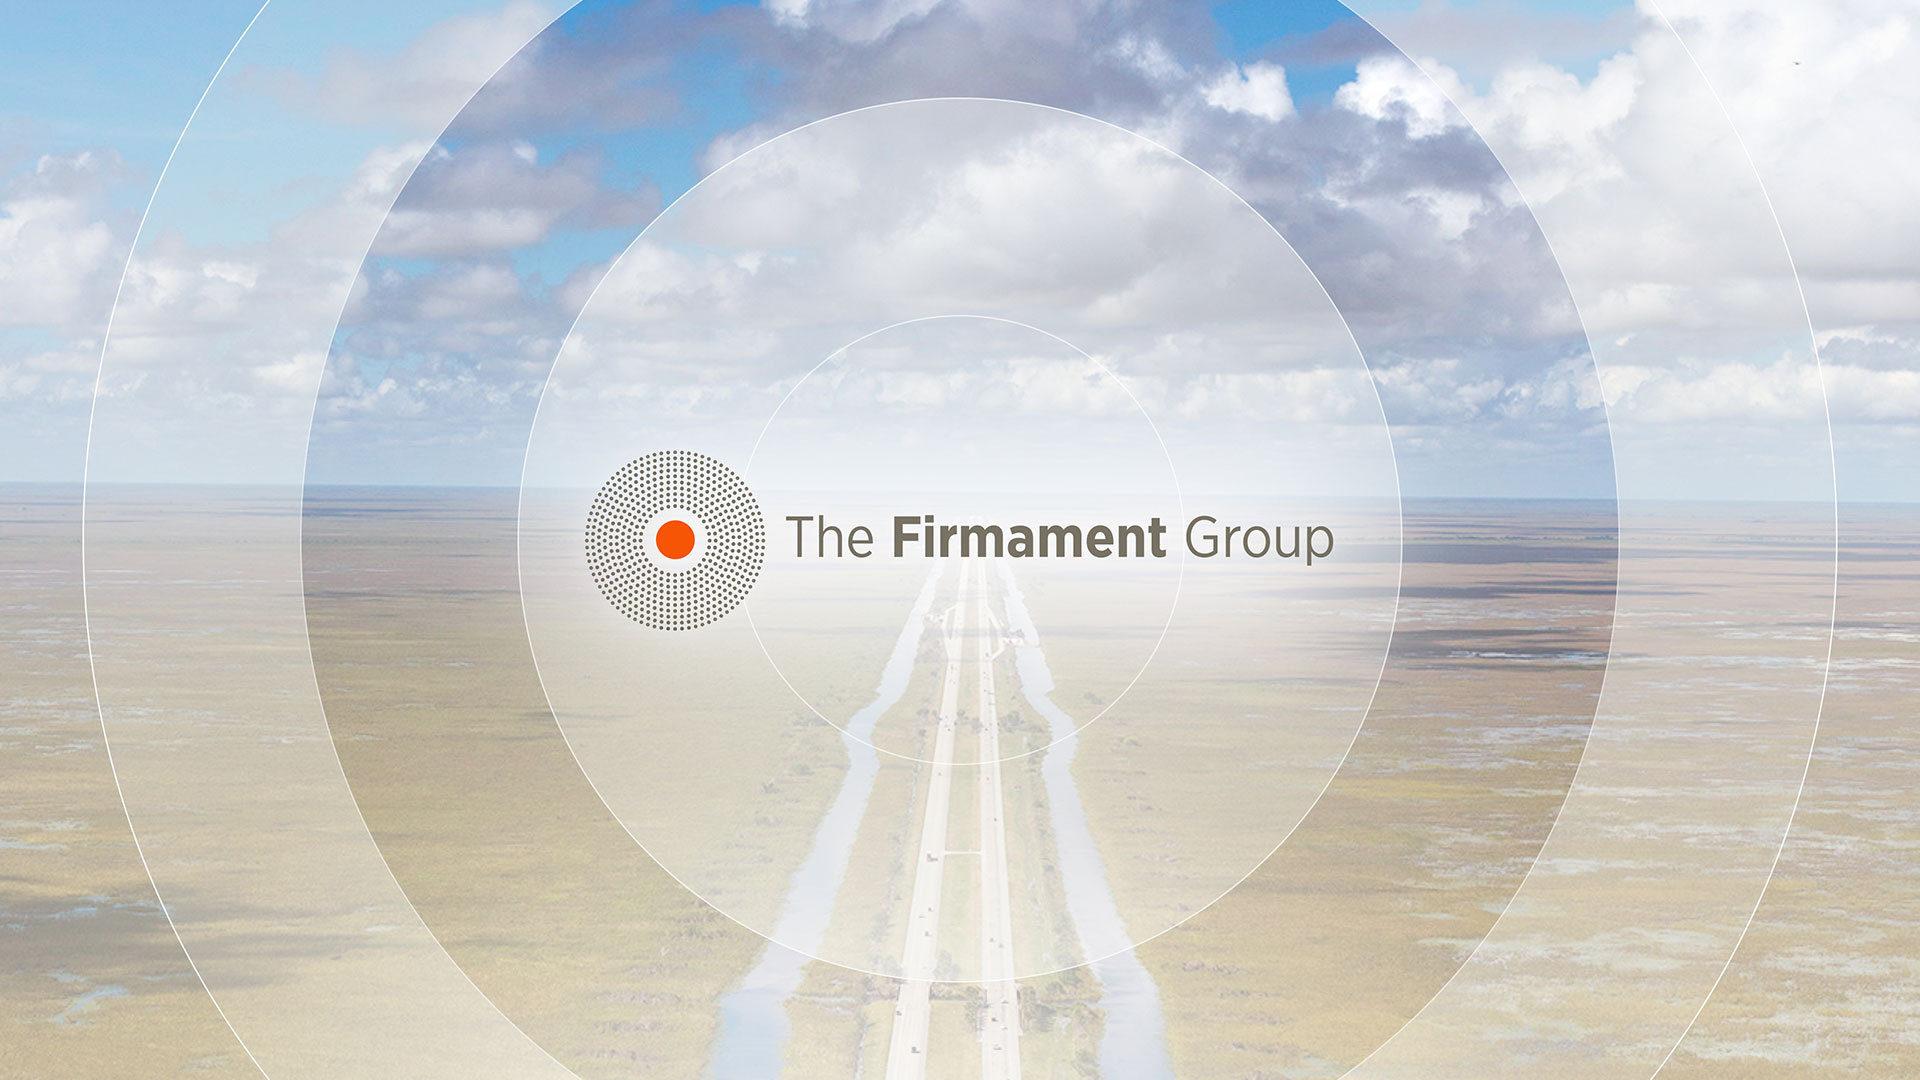 The Firmament Group Website Design and Development